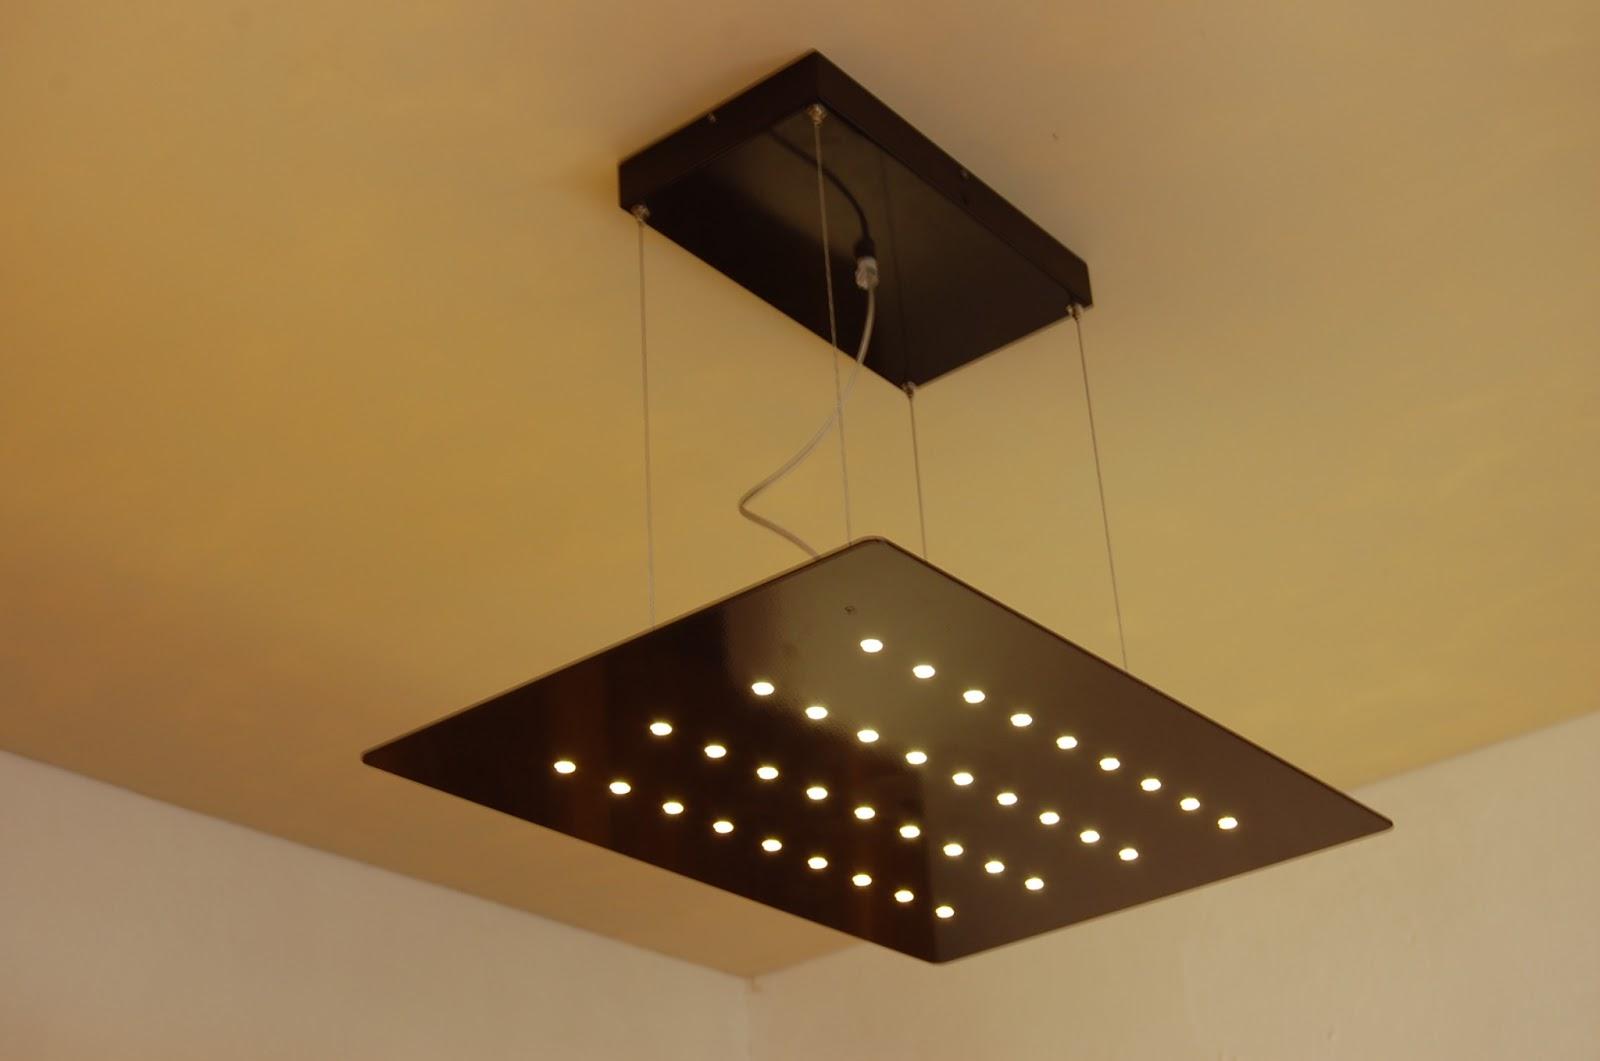 Illuminazione Emergenza Ristorante : Illuminazione di emergenza